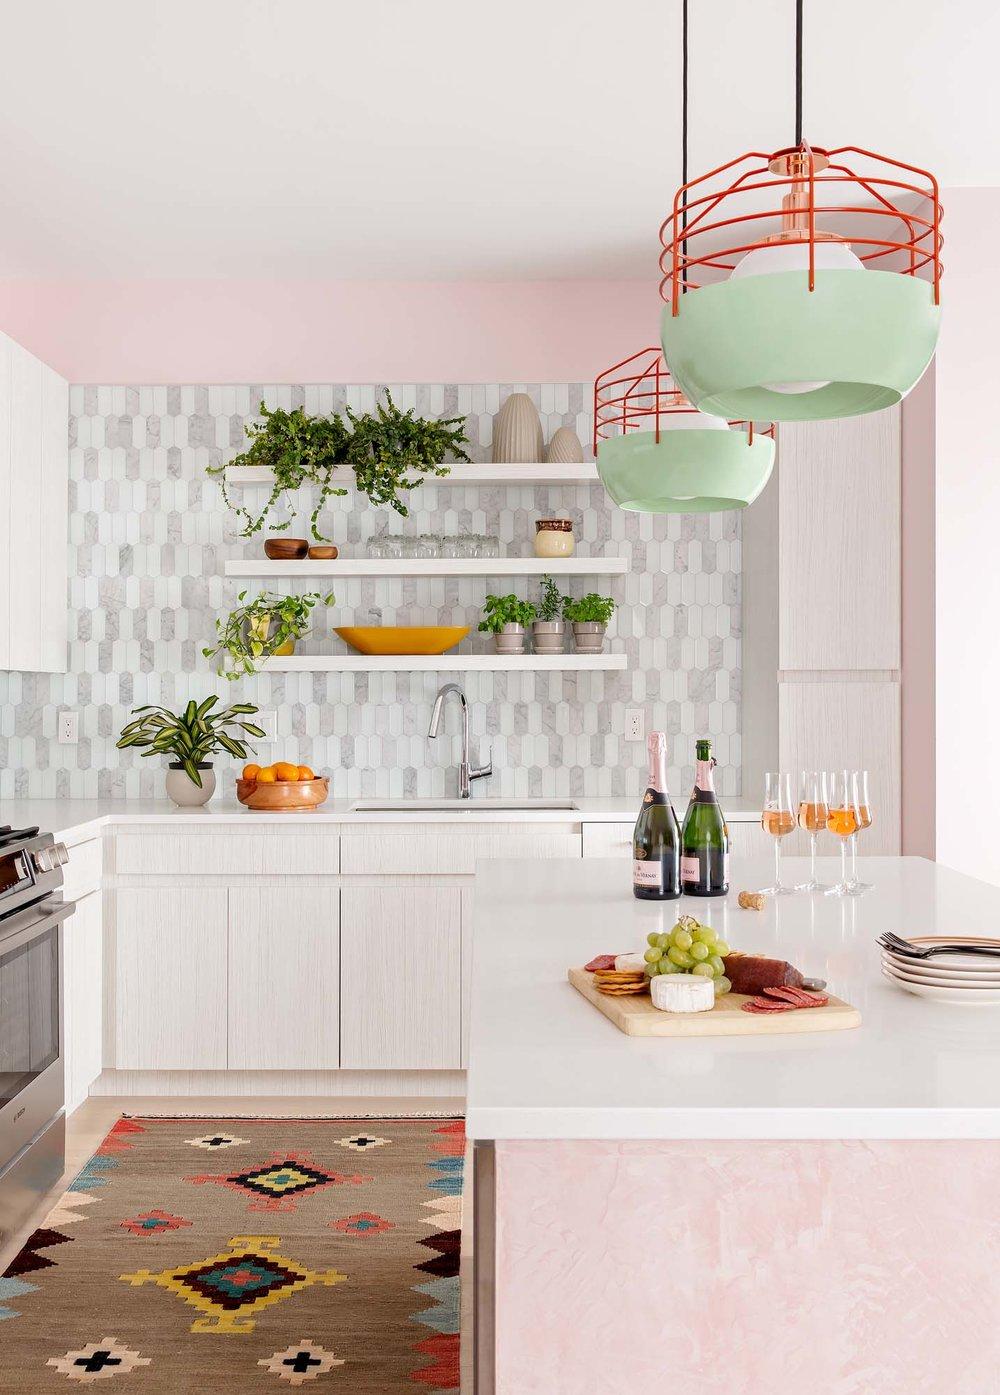 16-Best-Pink-Kitchen-Tiles-Floating-Shelves-Top-Interior-Designers-Boston-Cambridge-Seaport-Dane-Austin-Design.jpg